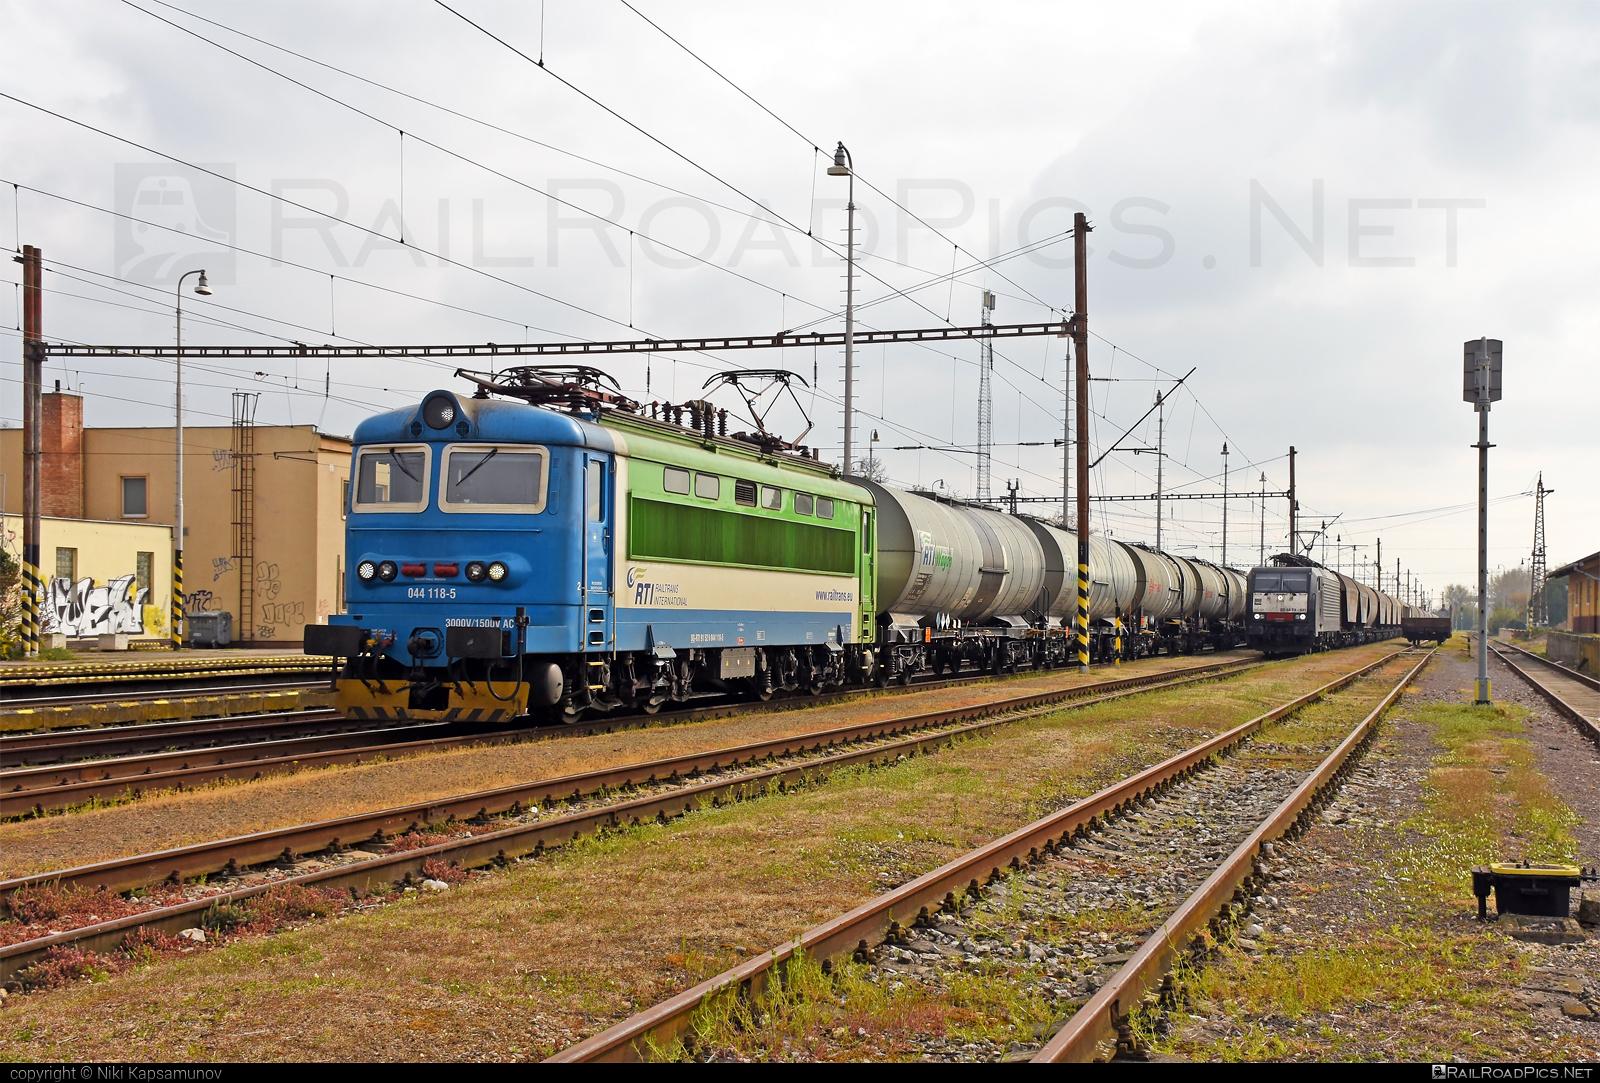 Škoda 73E - 044 118-5 operated by Railtrans International, s.r.o #RailtransInternational #kesselwagen #locomotive242 #plechac #rti #skoda #skoda73e #tankwagon